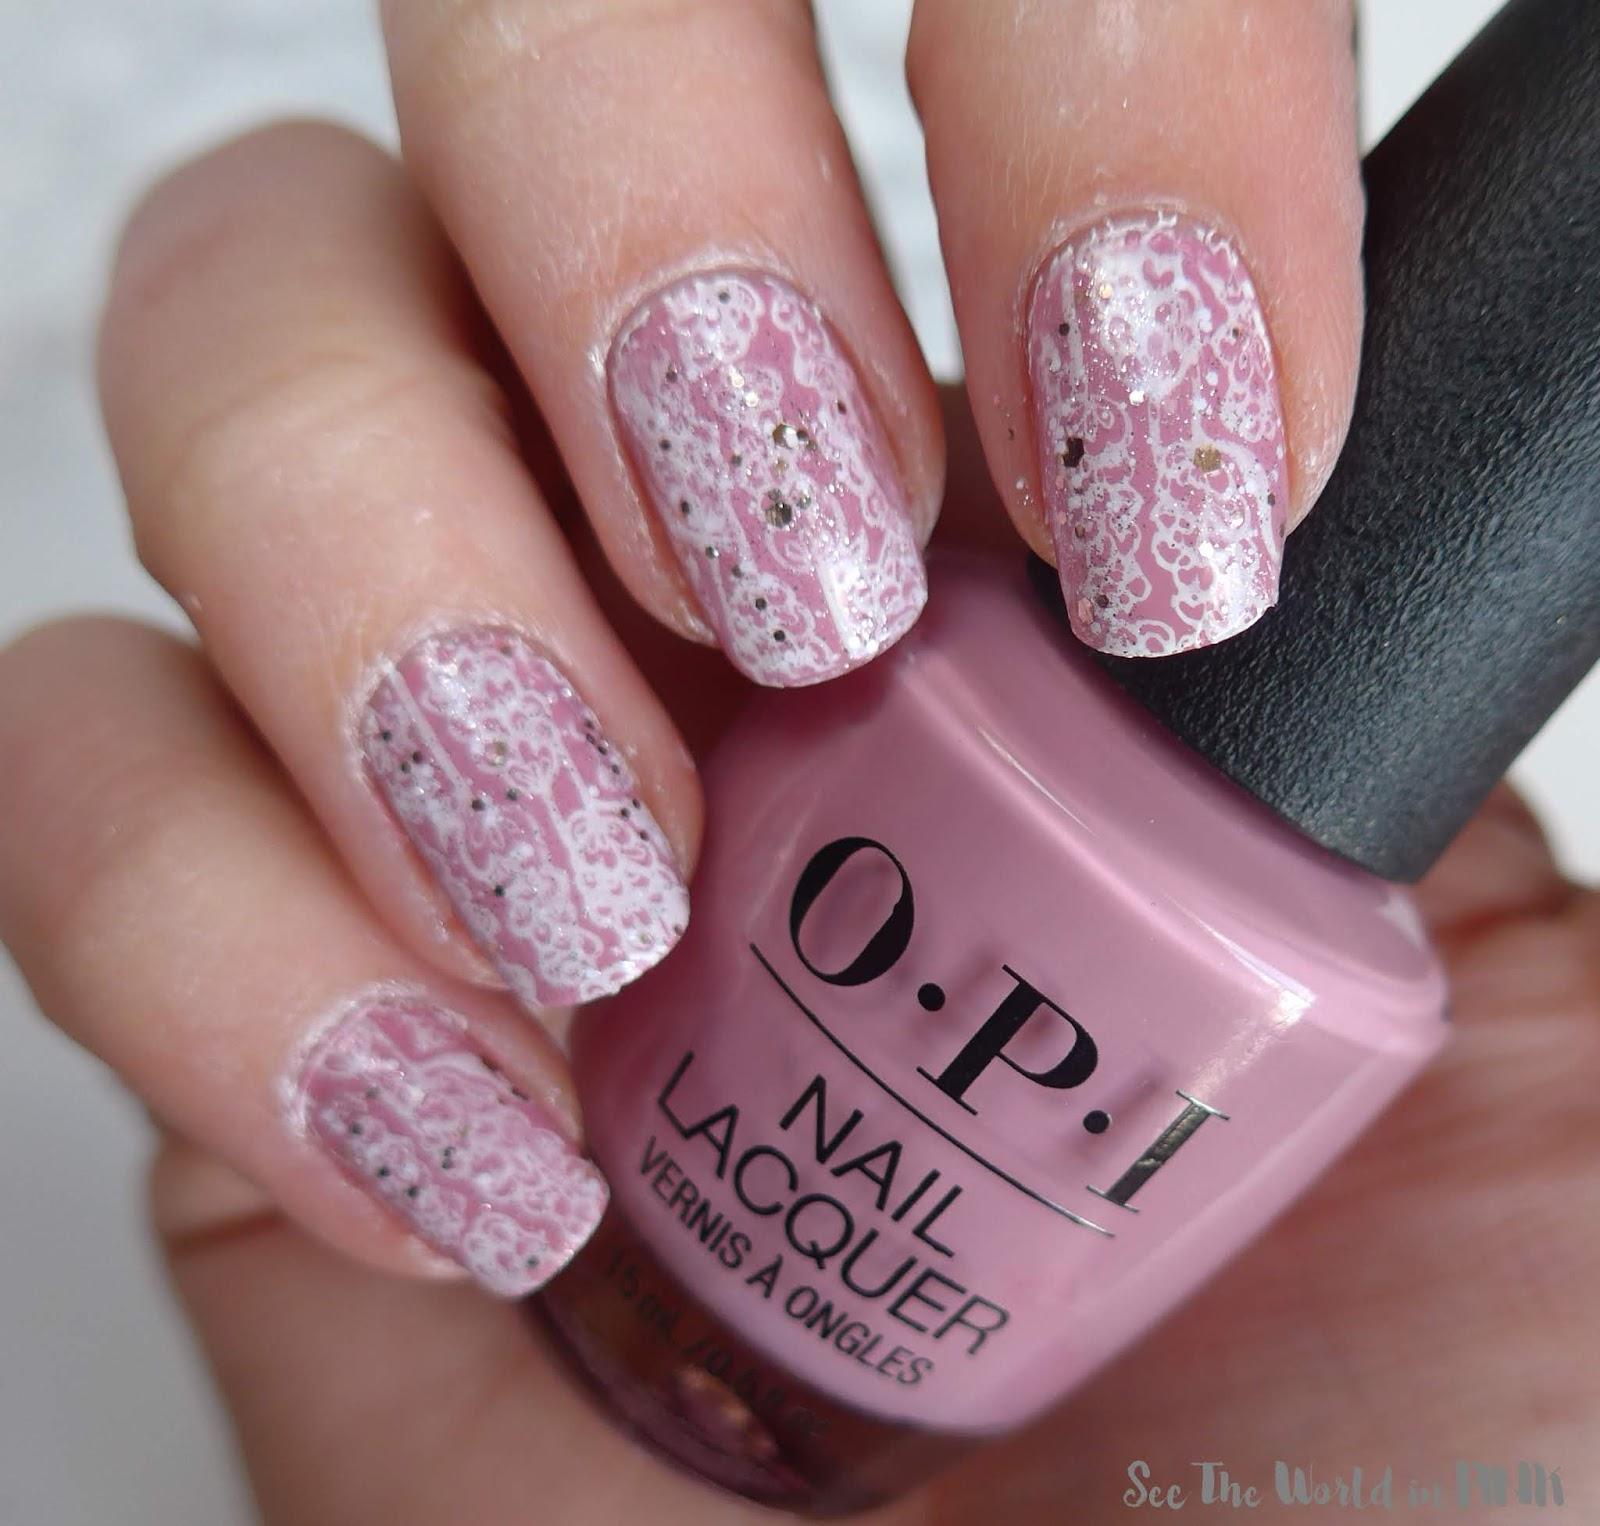 Manicure Monday - Pink, Floral & Glitter Bridal Nails